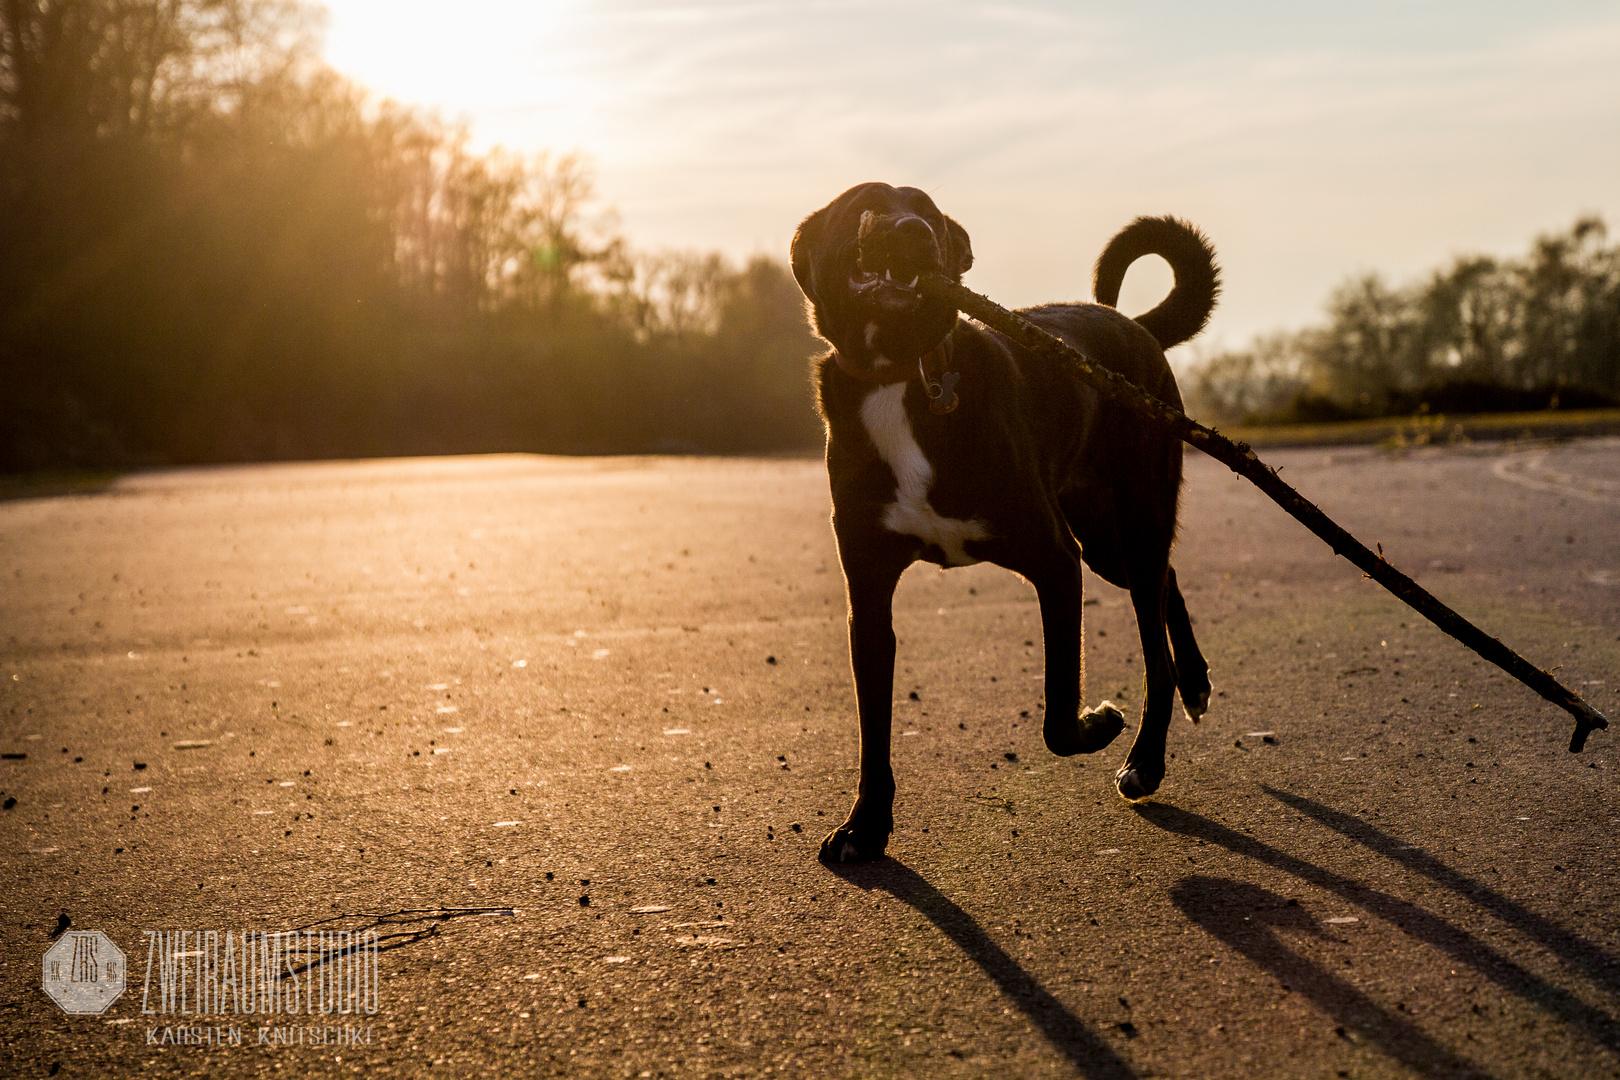 Klasse Sonnenuntergangs spaziergang